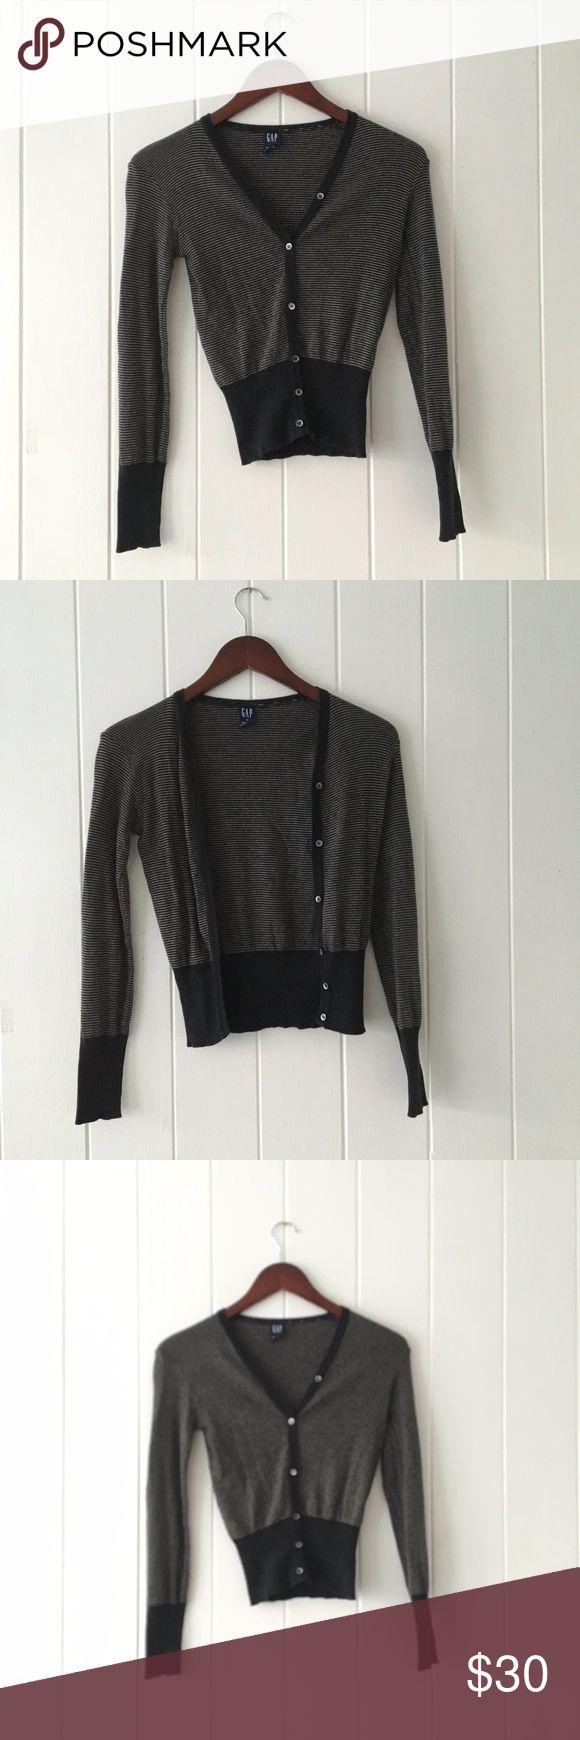 Gap Striped Black & White Cardigan Sweater Small pin-striped Long sleeve sweater 100% Cotton Fall / Winter Outerwear Basic Cardigan GAP Sweaters Cardigans